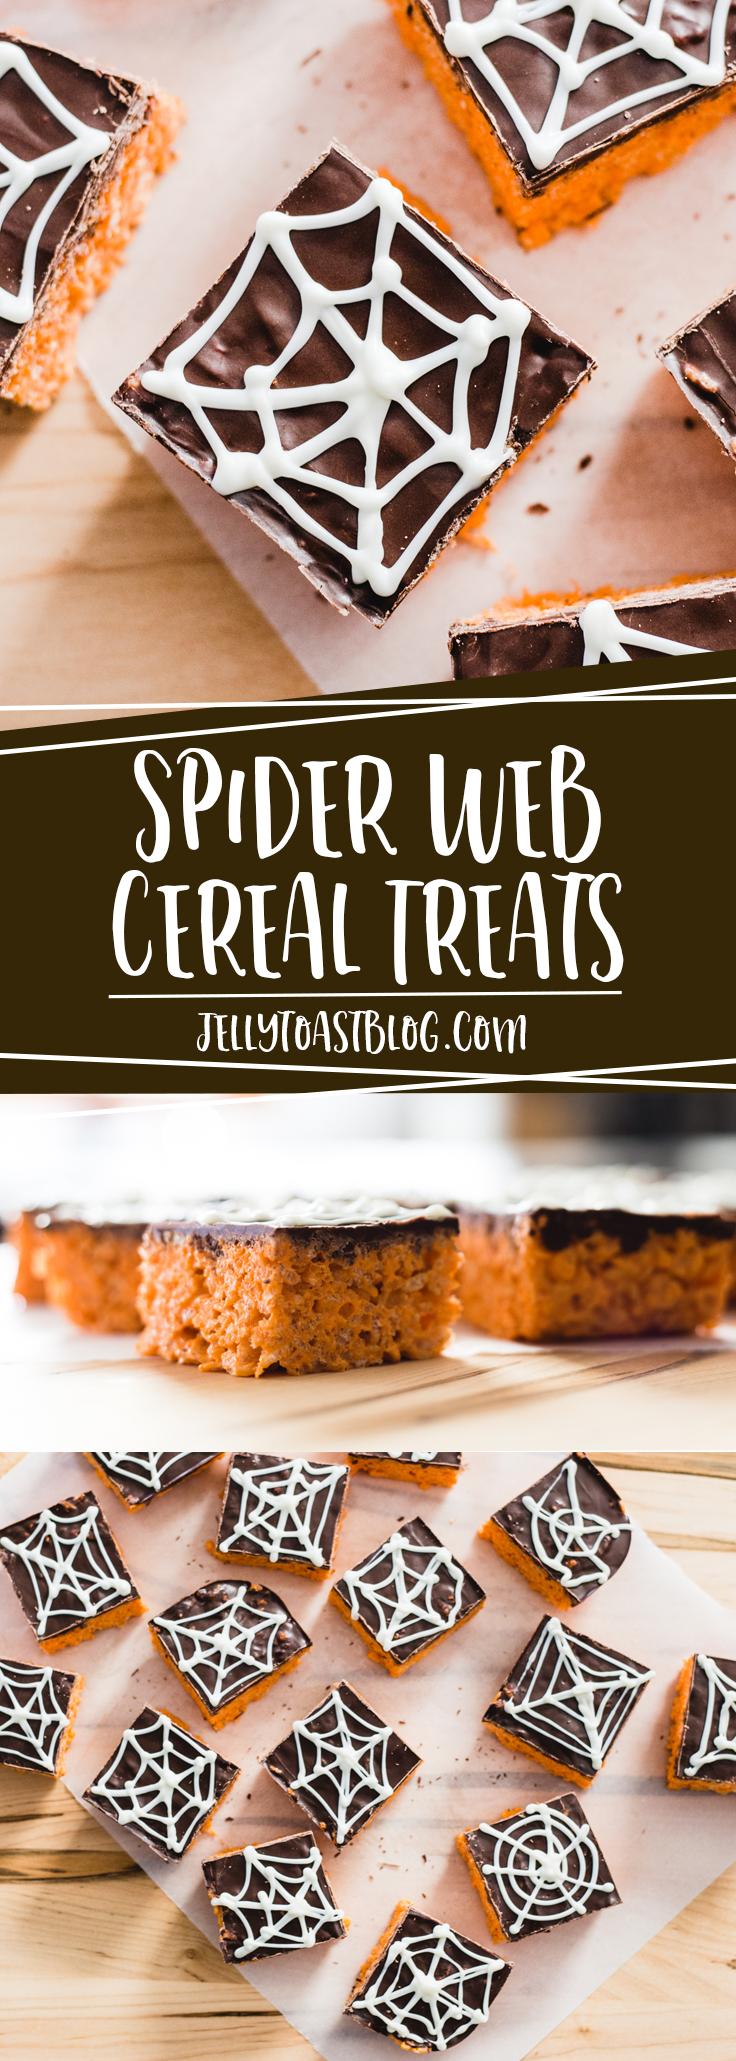 Spider Web Cereal Treats from Jelly Toast Blog jellytoastblog.com with Campfire Marshmallows HallowMallows